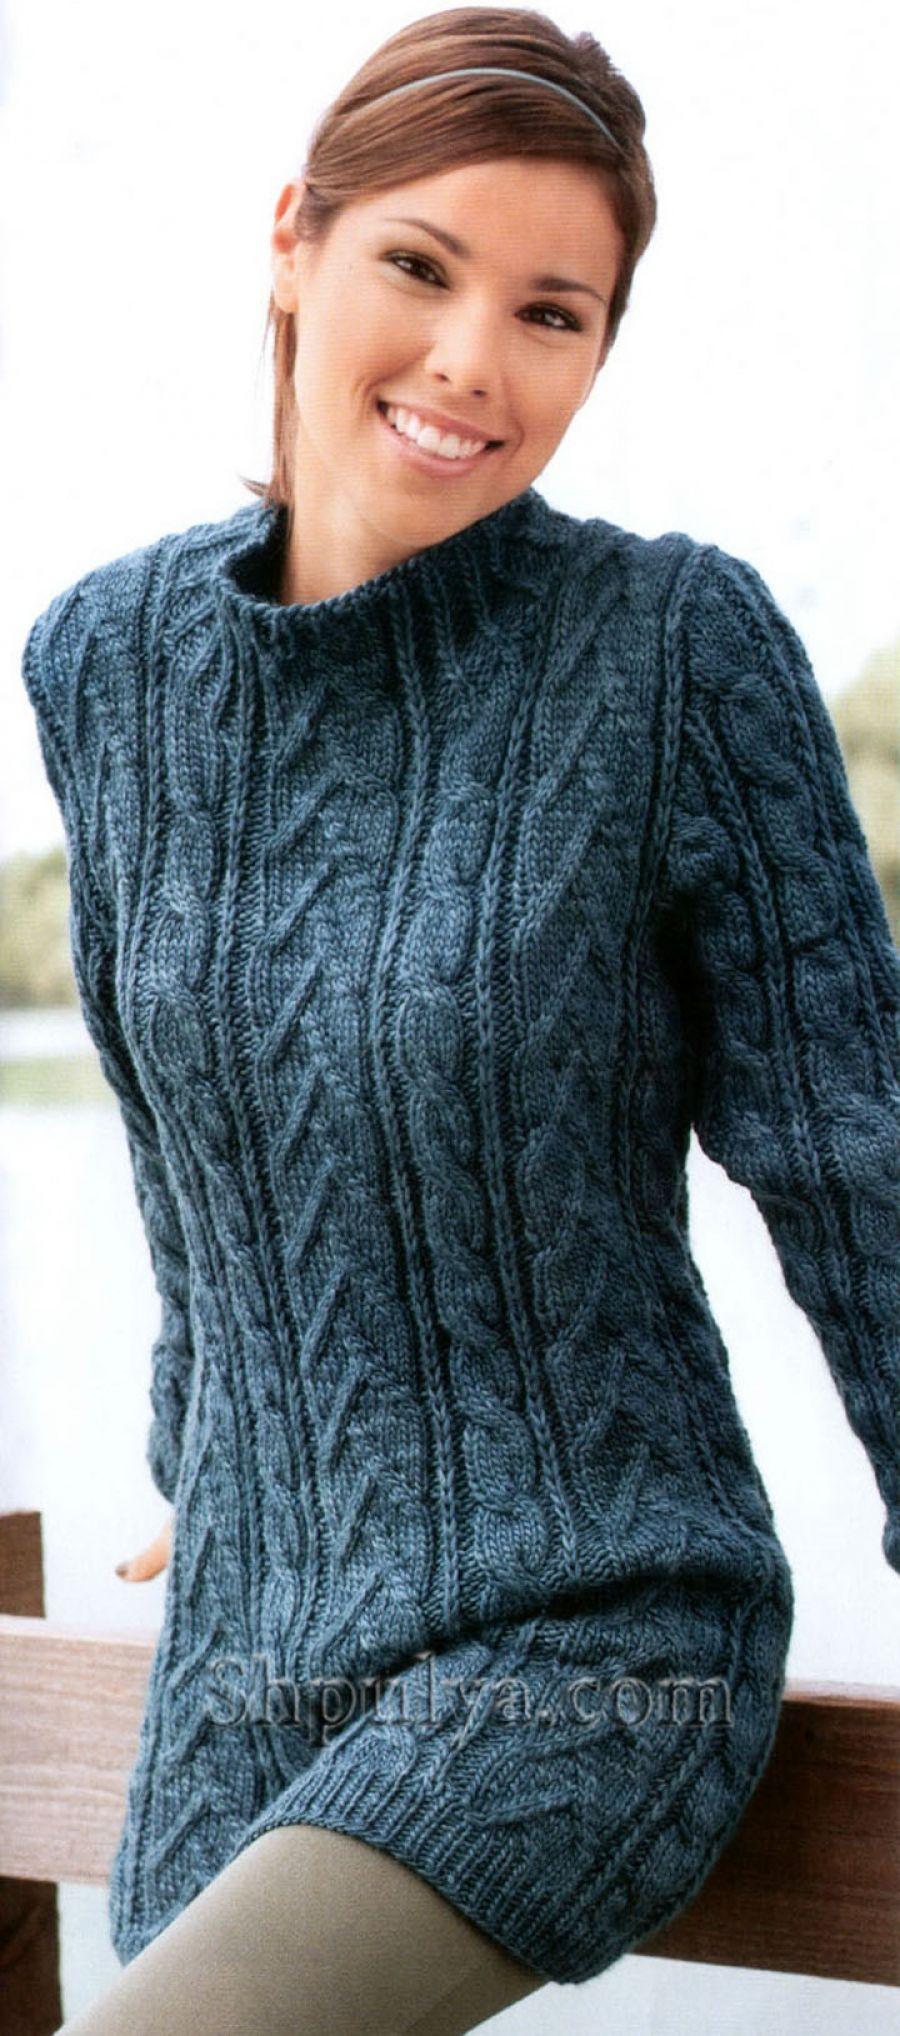 Long patterned sweater knitting needles | crefftau | Pinterest ...